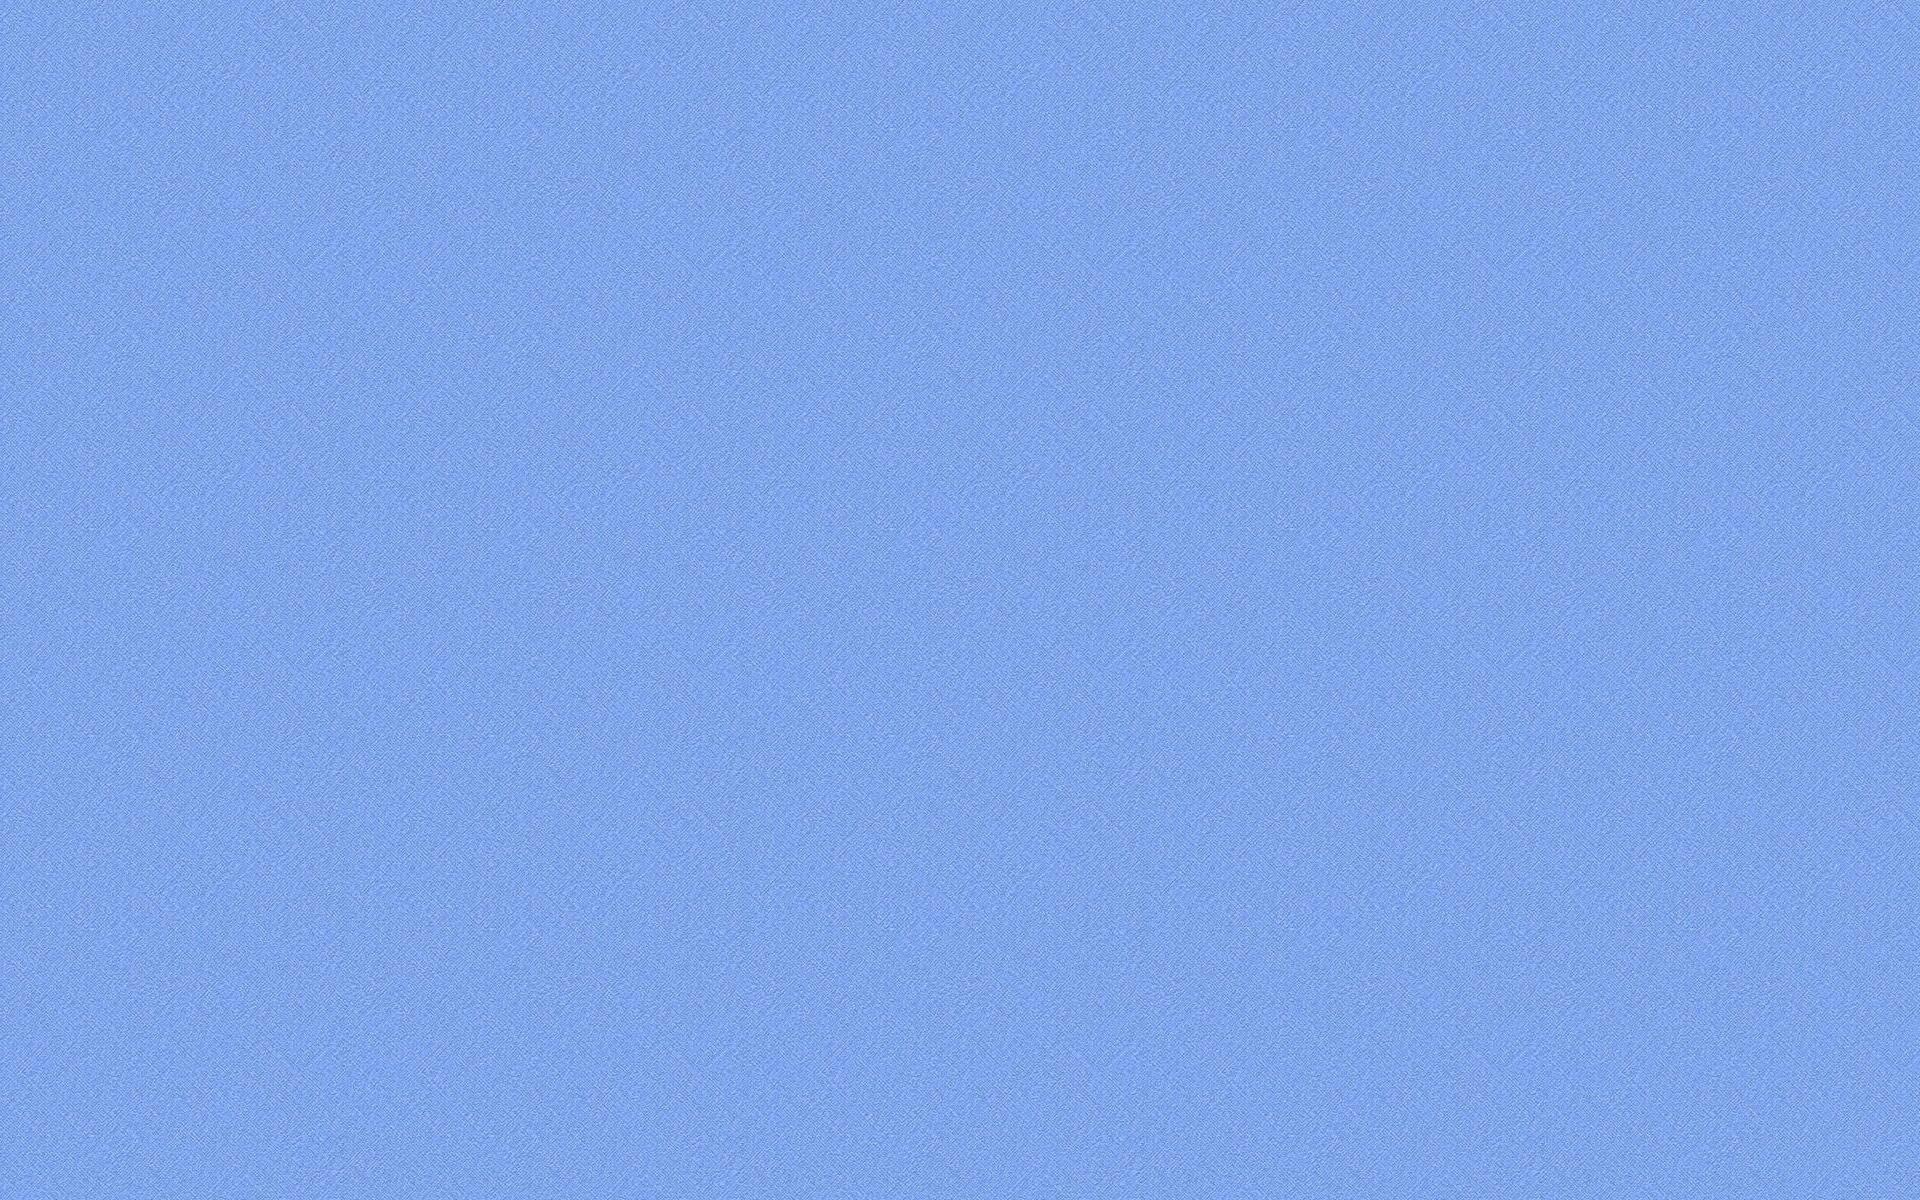 Blue Texture Desktop Wallpaper Colorful With Photos Of Blue Texture 1920x1200